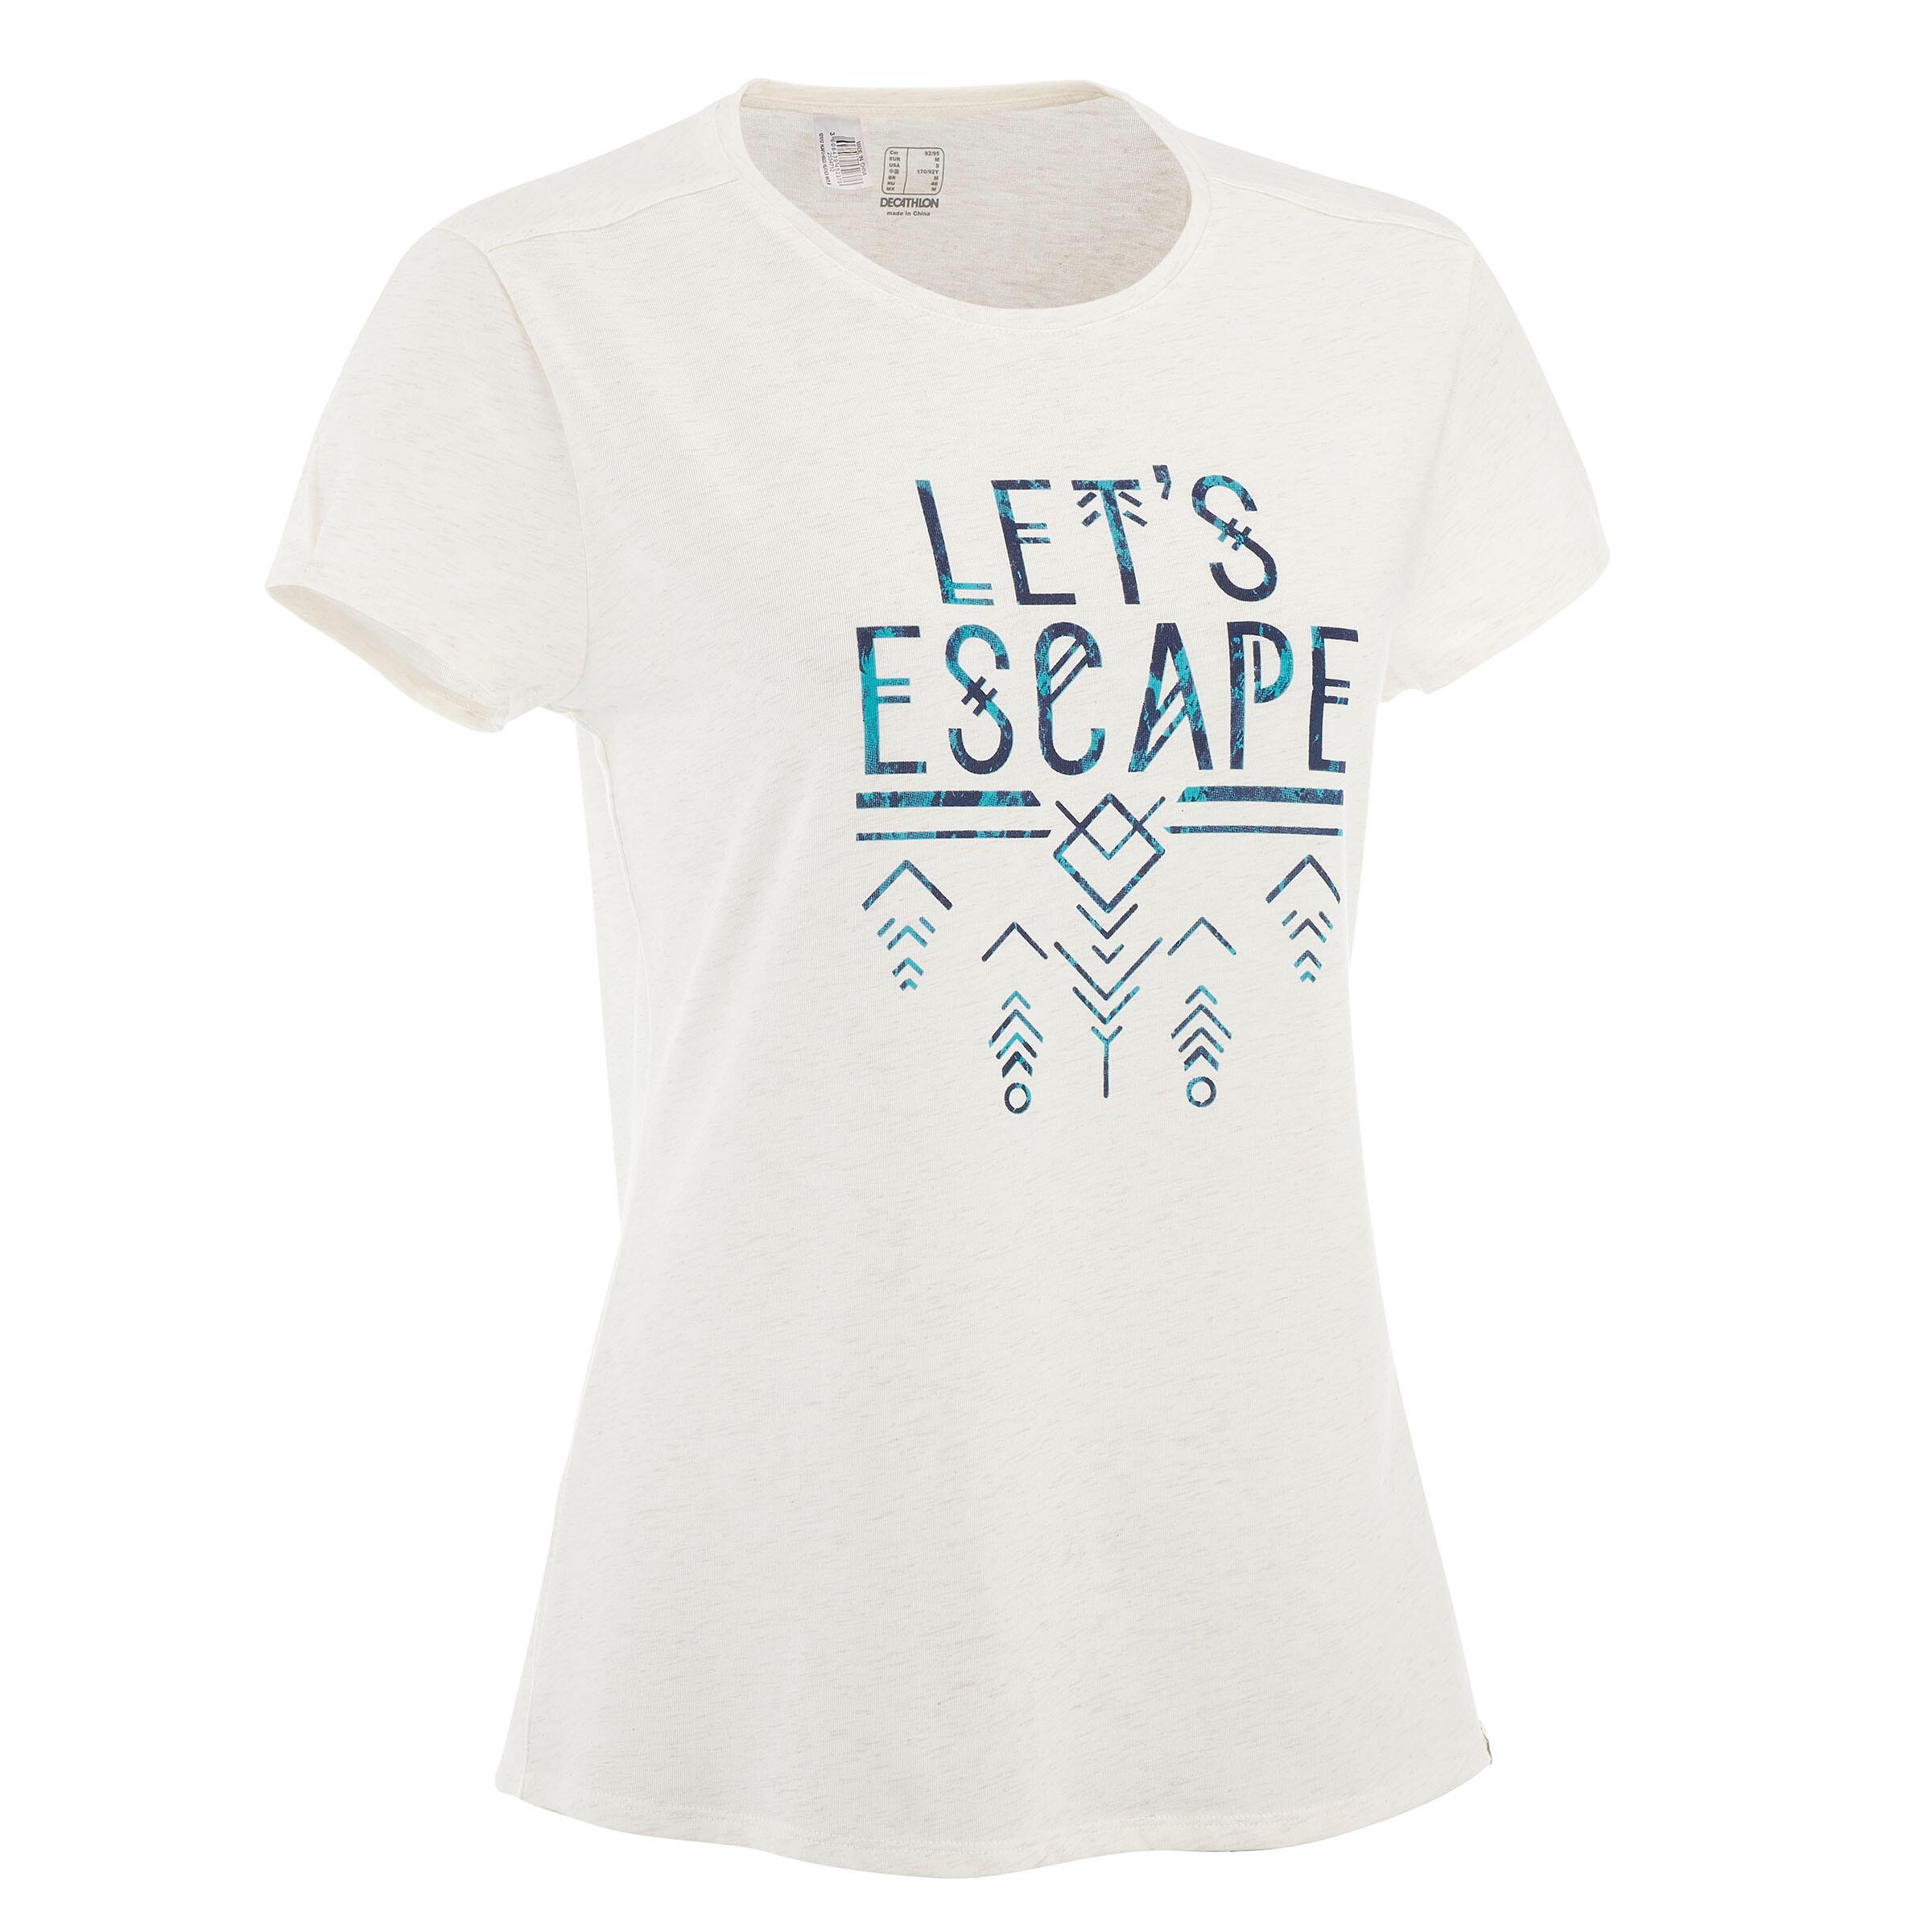 NH500 Women's Country Walking T-shirt - Mottled White